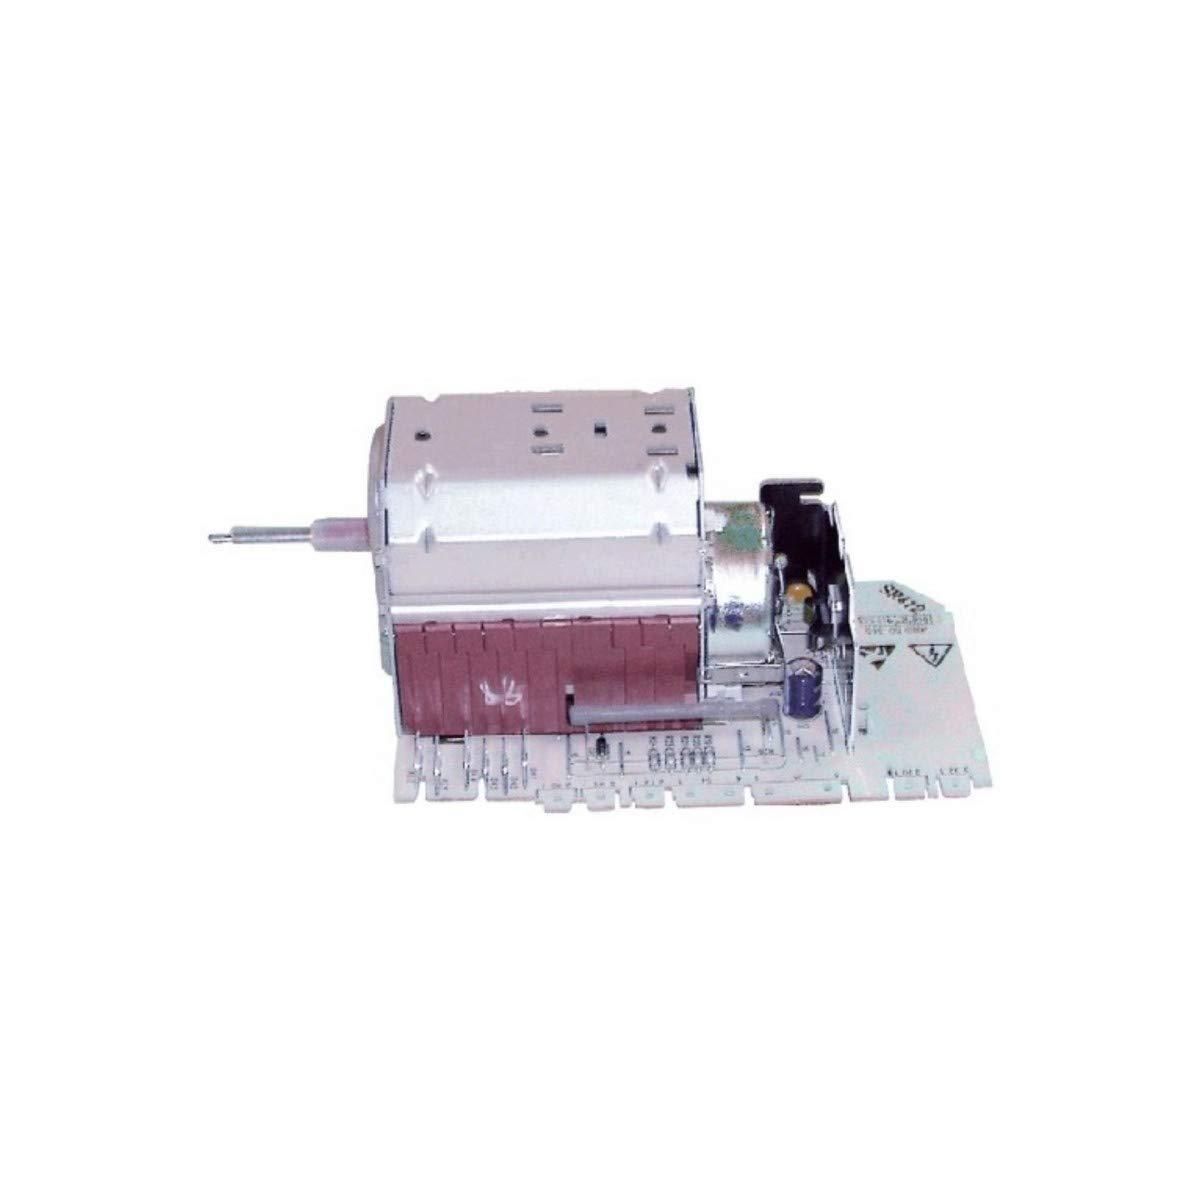 Recamania Programador Lavadora Electrolux EW813F 1249214147: Amazon.es